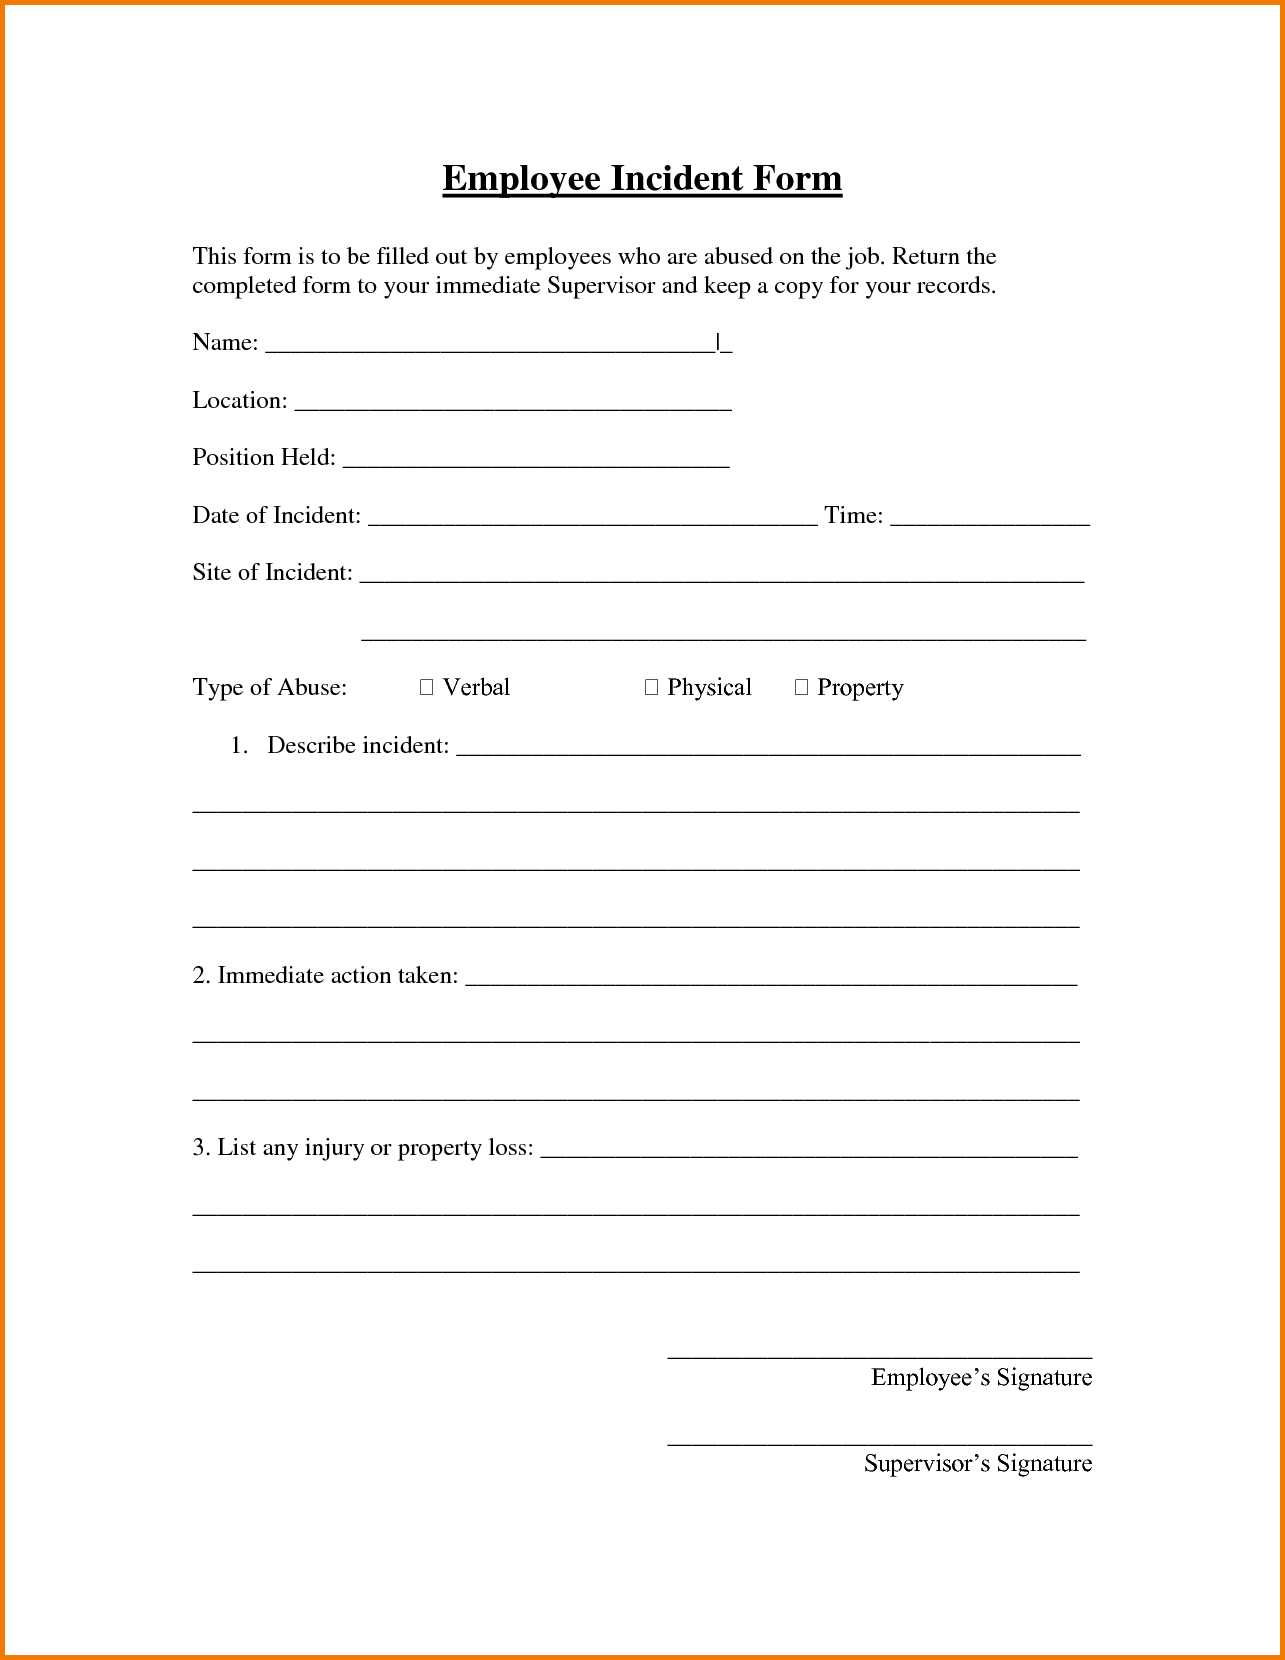 Employee Incident Report Form Template - Karati.ald2014 Pertaining To Incident Report Form Template Qld